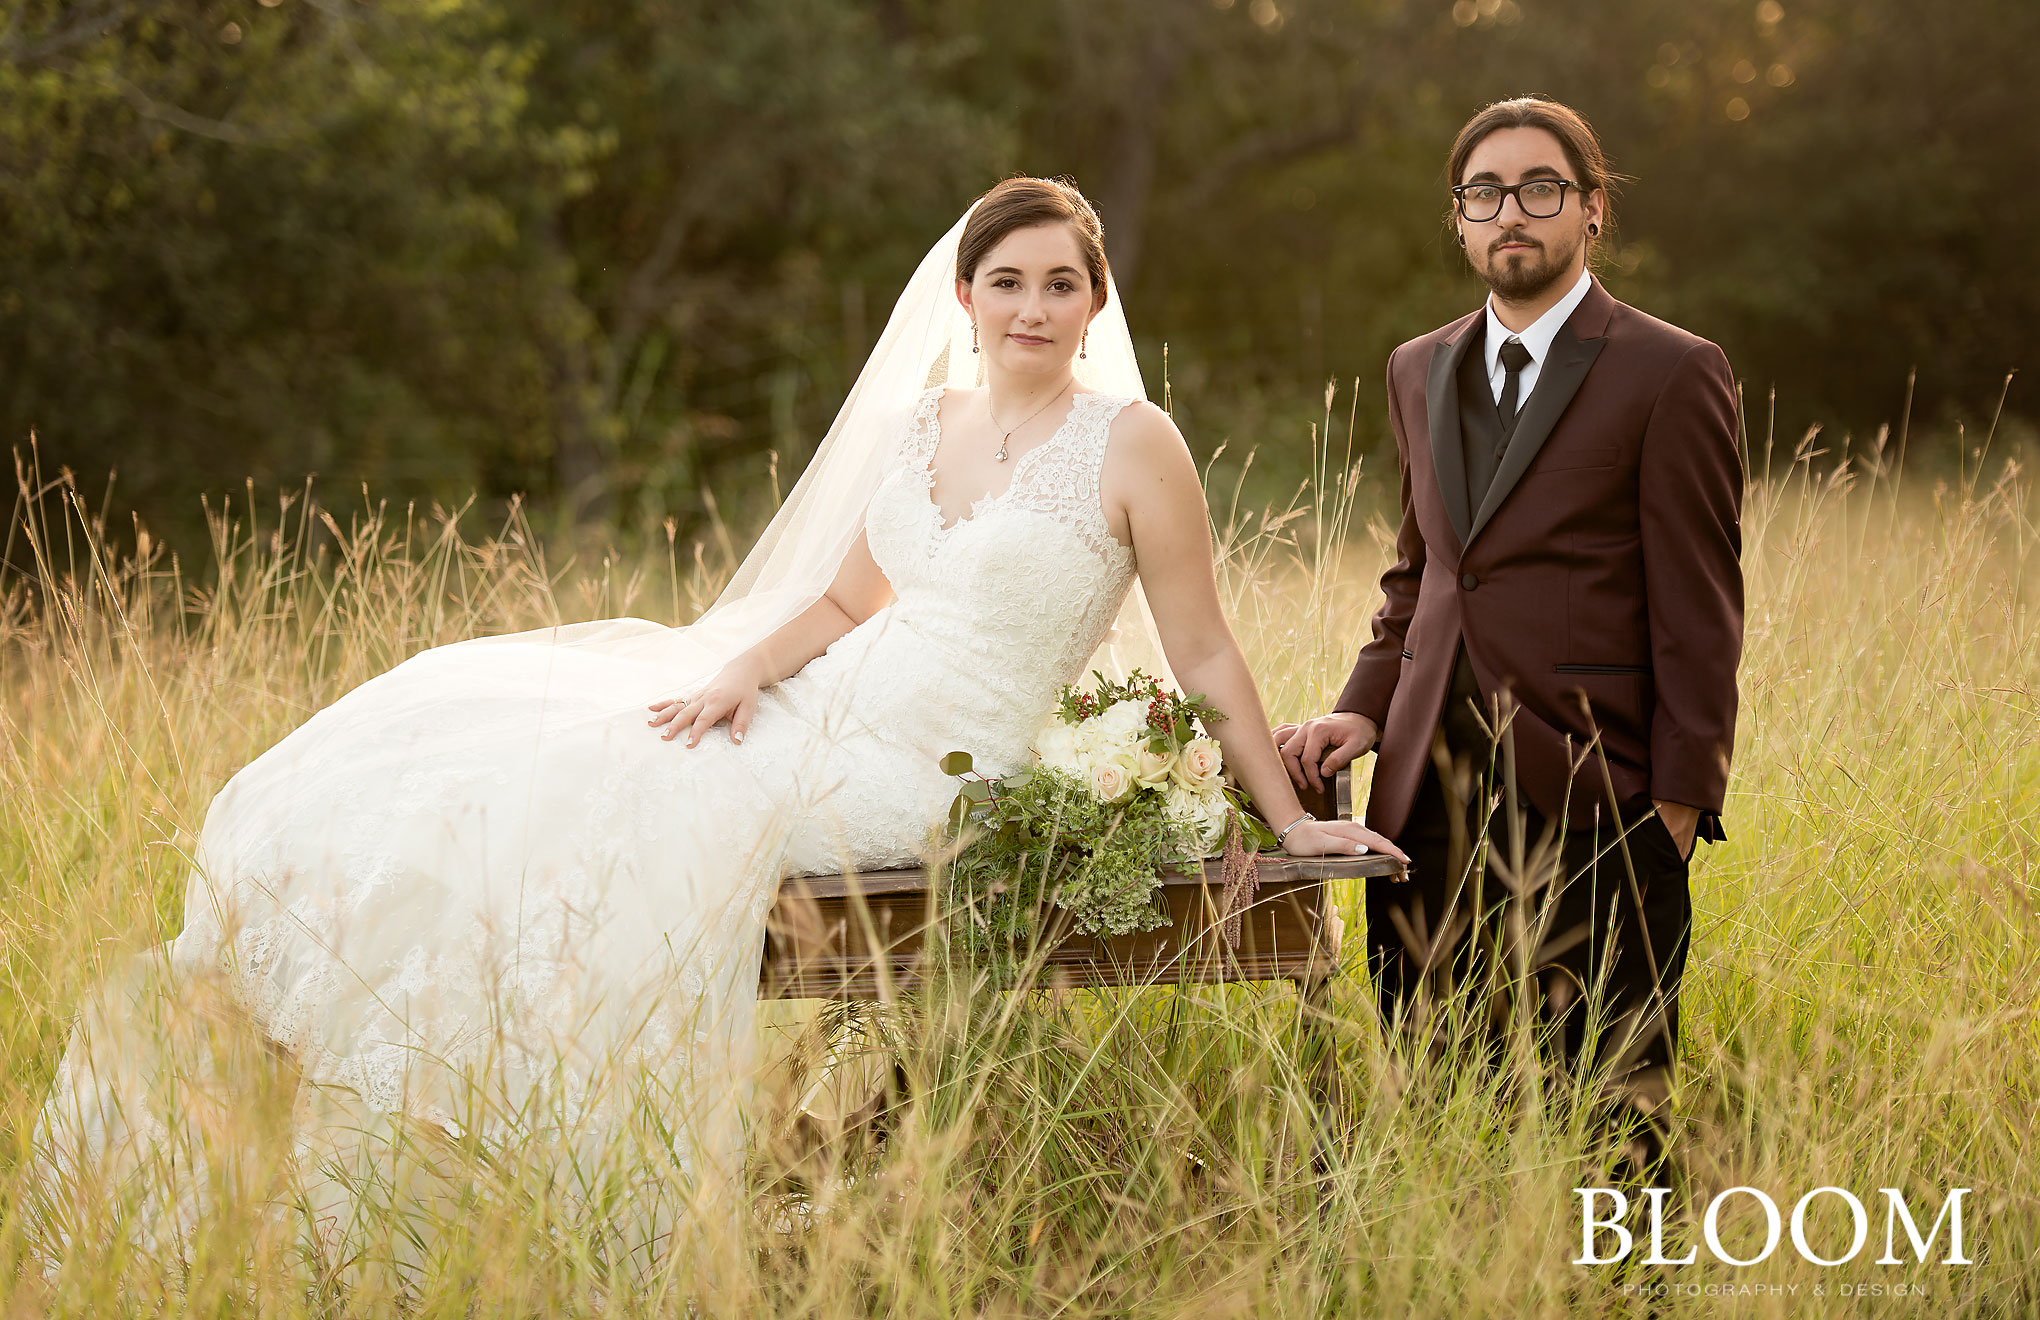 Wedding_photography_san_antonio_texas_bloom_NMM_6204.jpg